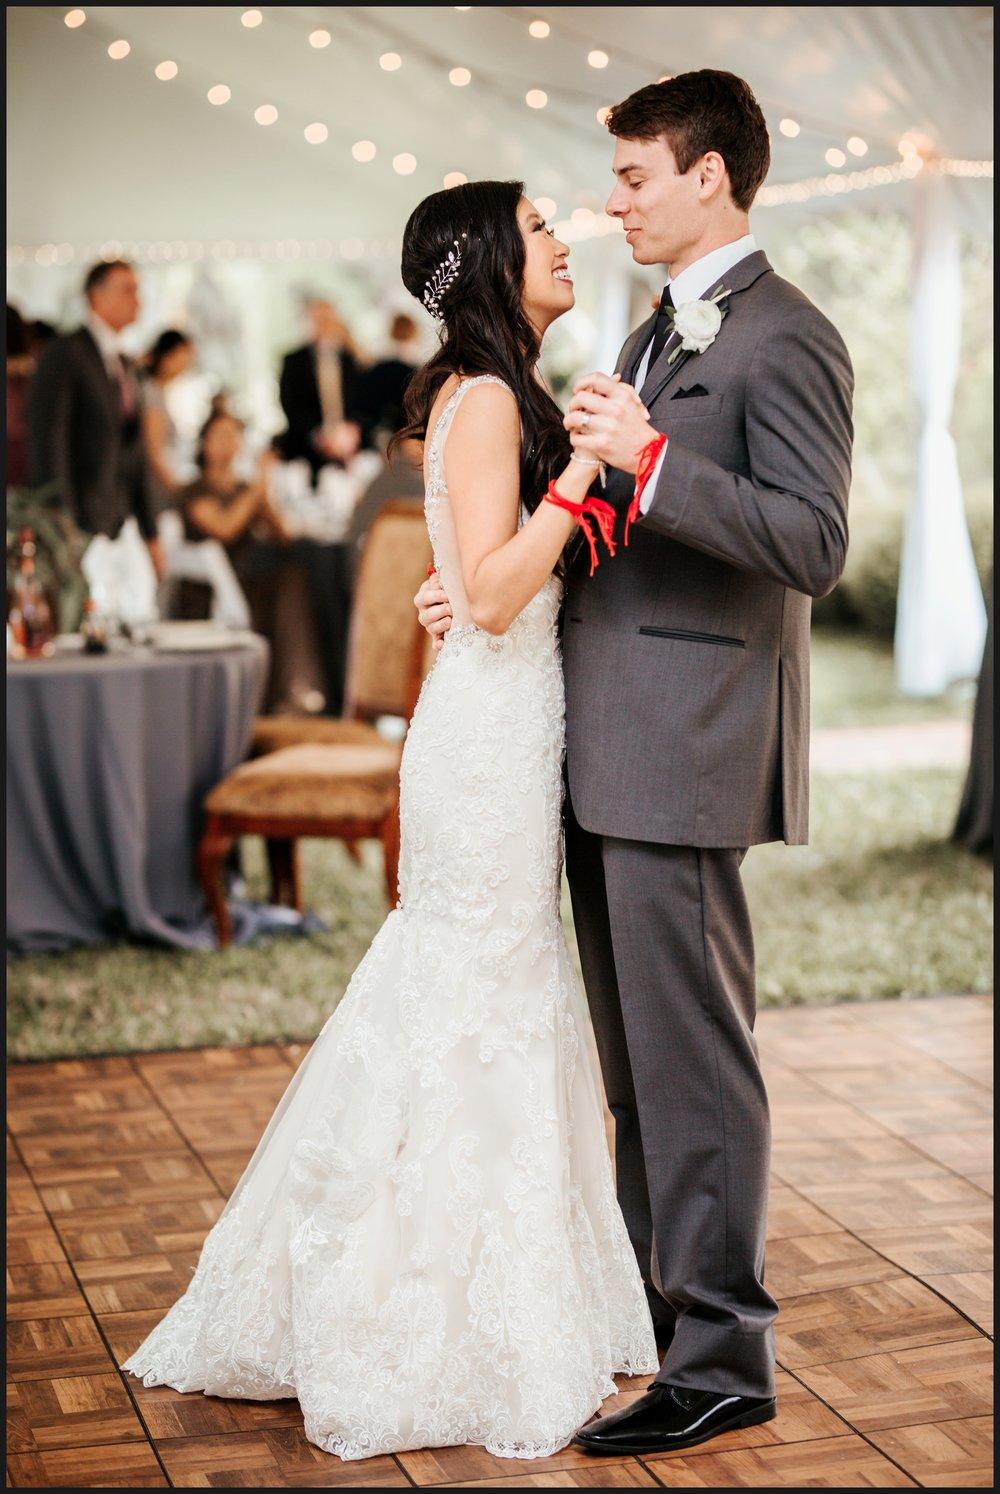 Orlando-Wedding-Photographer-destination-wedding-photographer-florida-wedding-photographer-bohemian-wedding-photographer_1446.jpg